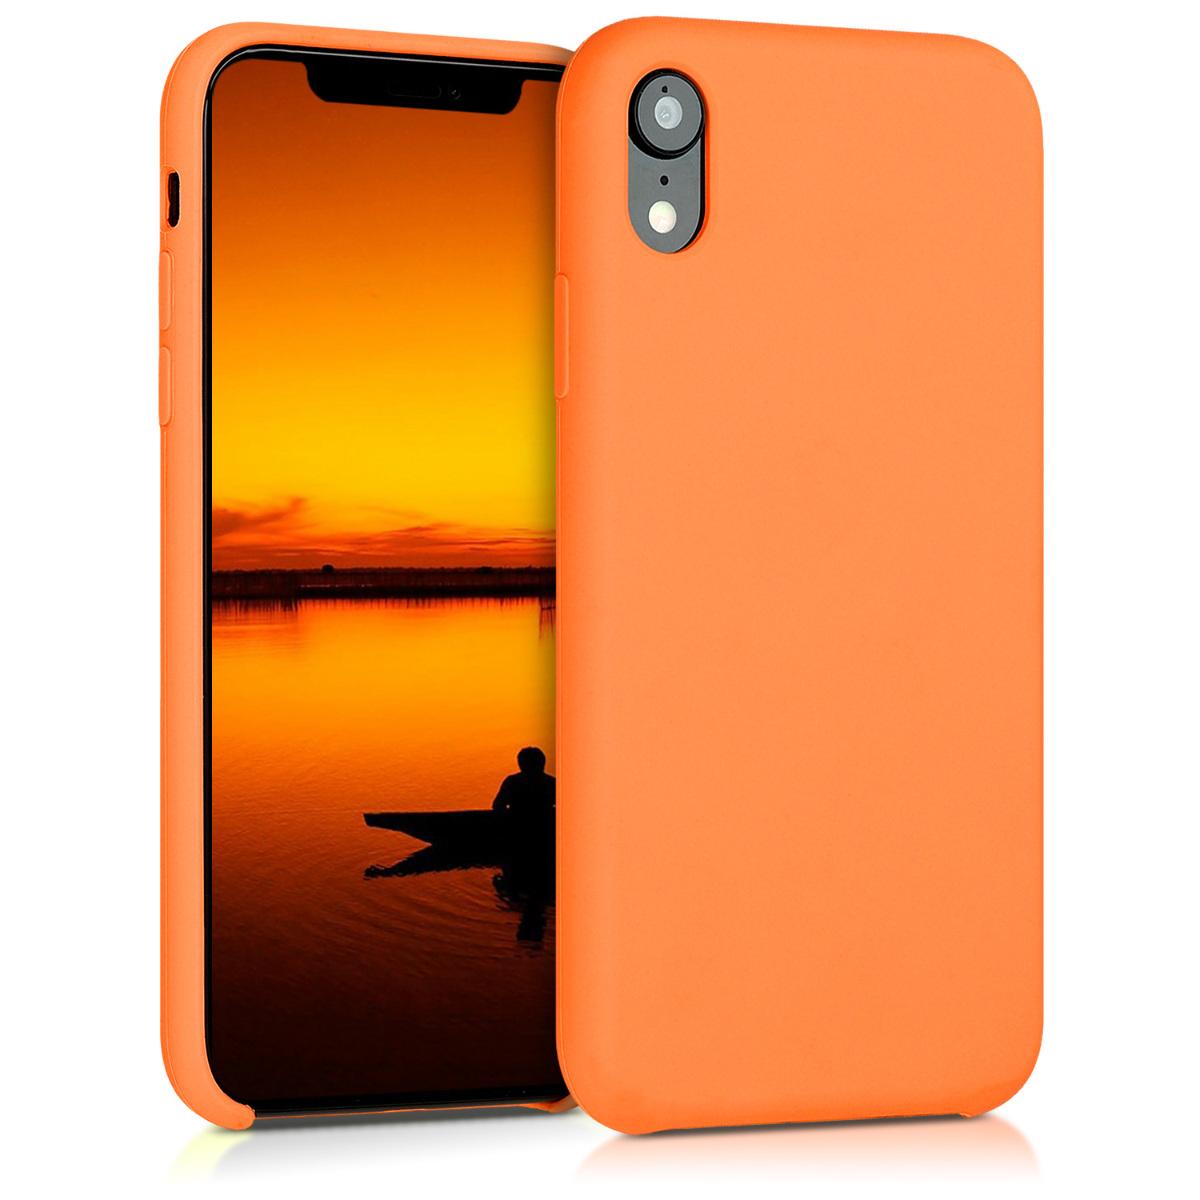 KW Θήκη Σιλικόνης Apple iPhone XR - Cosmic Orange (45910.150)